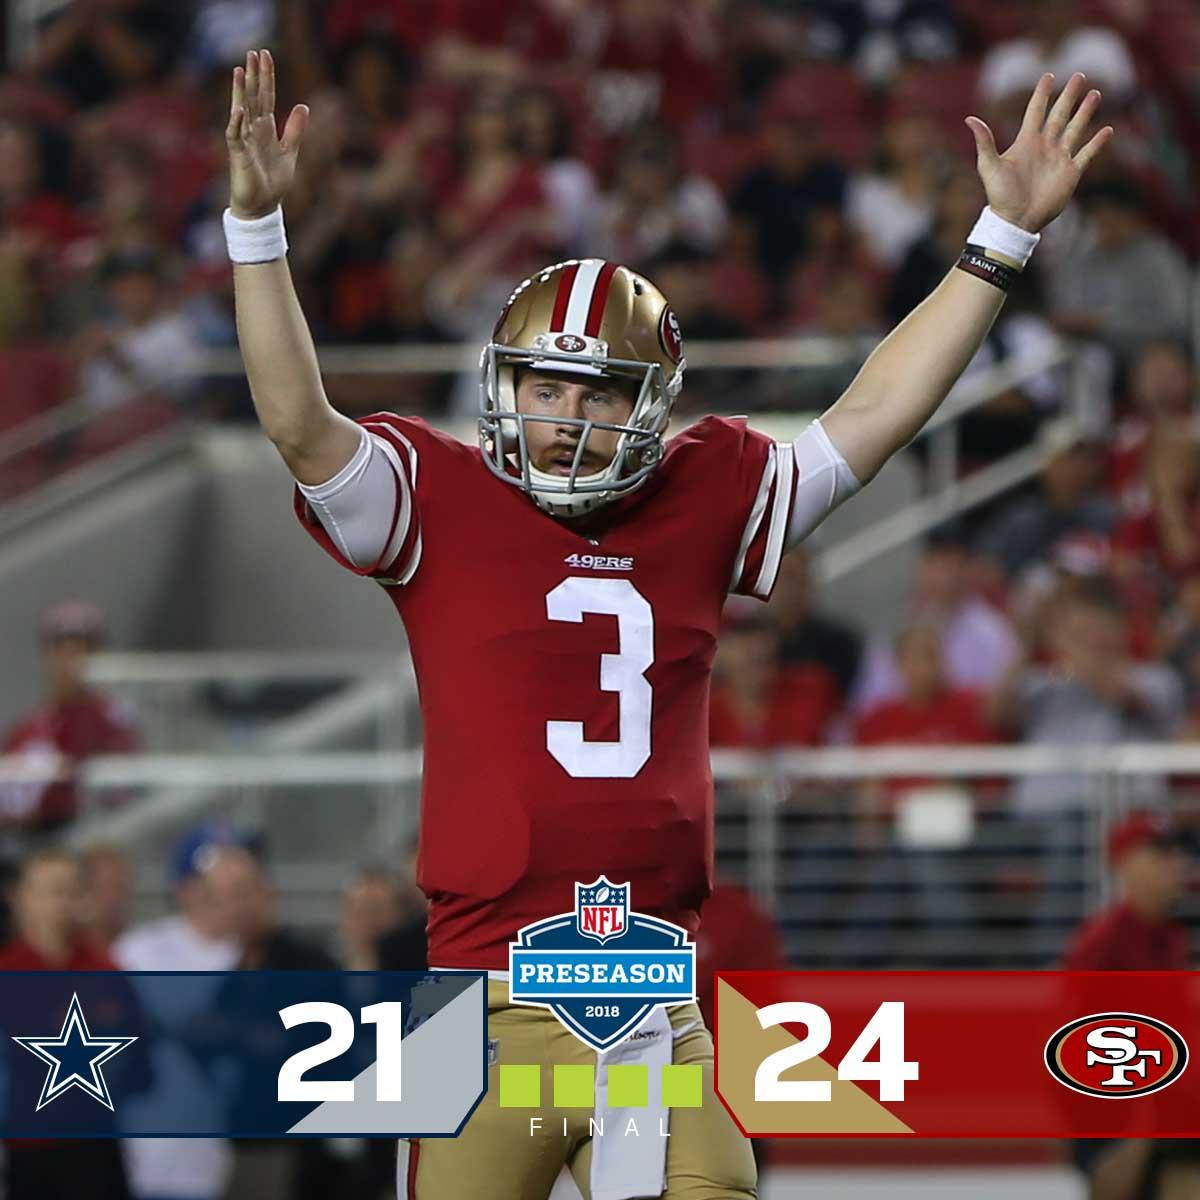 NFL's photo on #DALvsSF